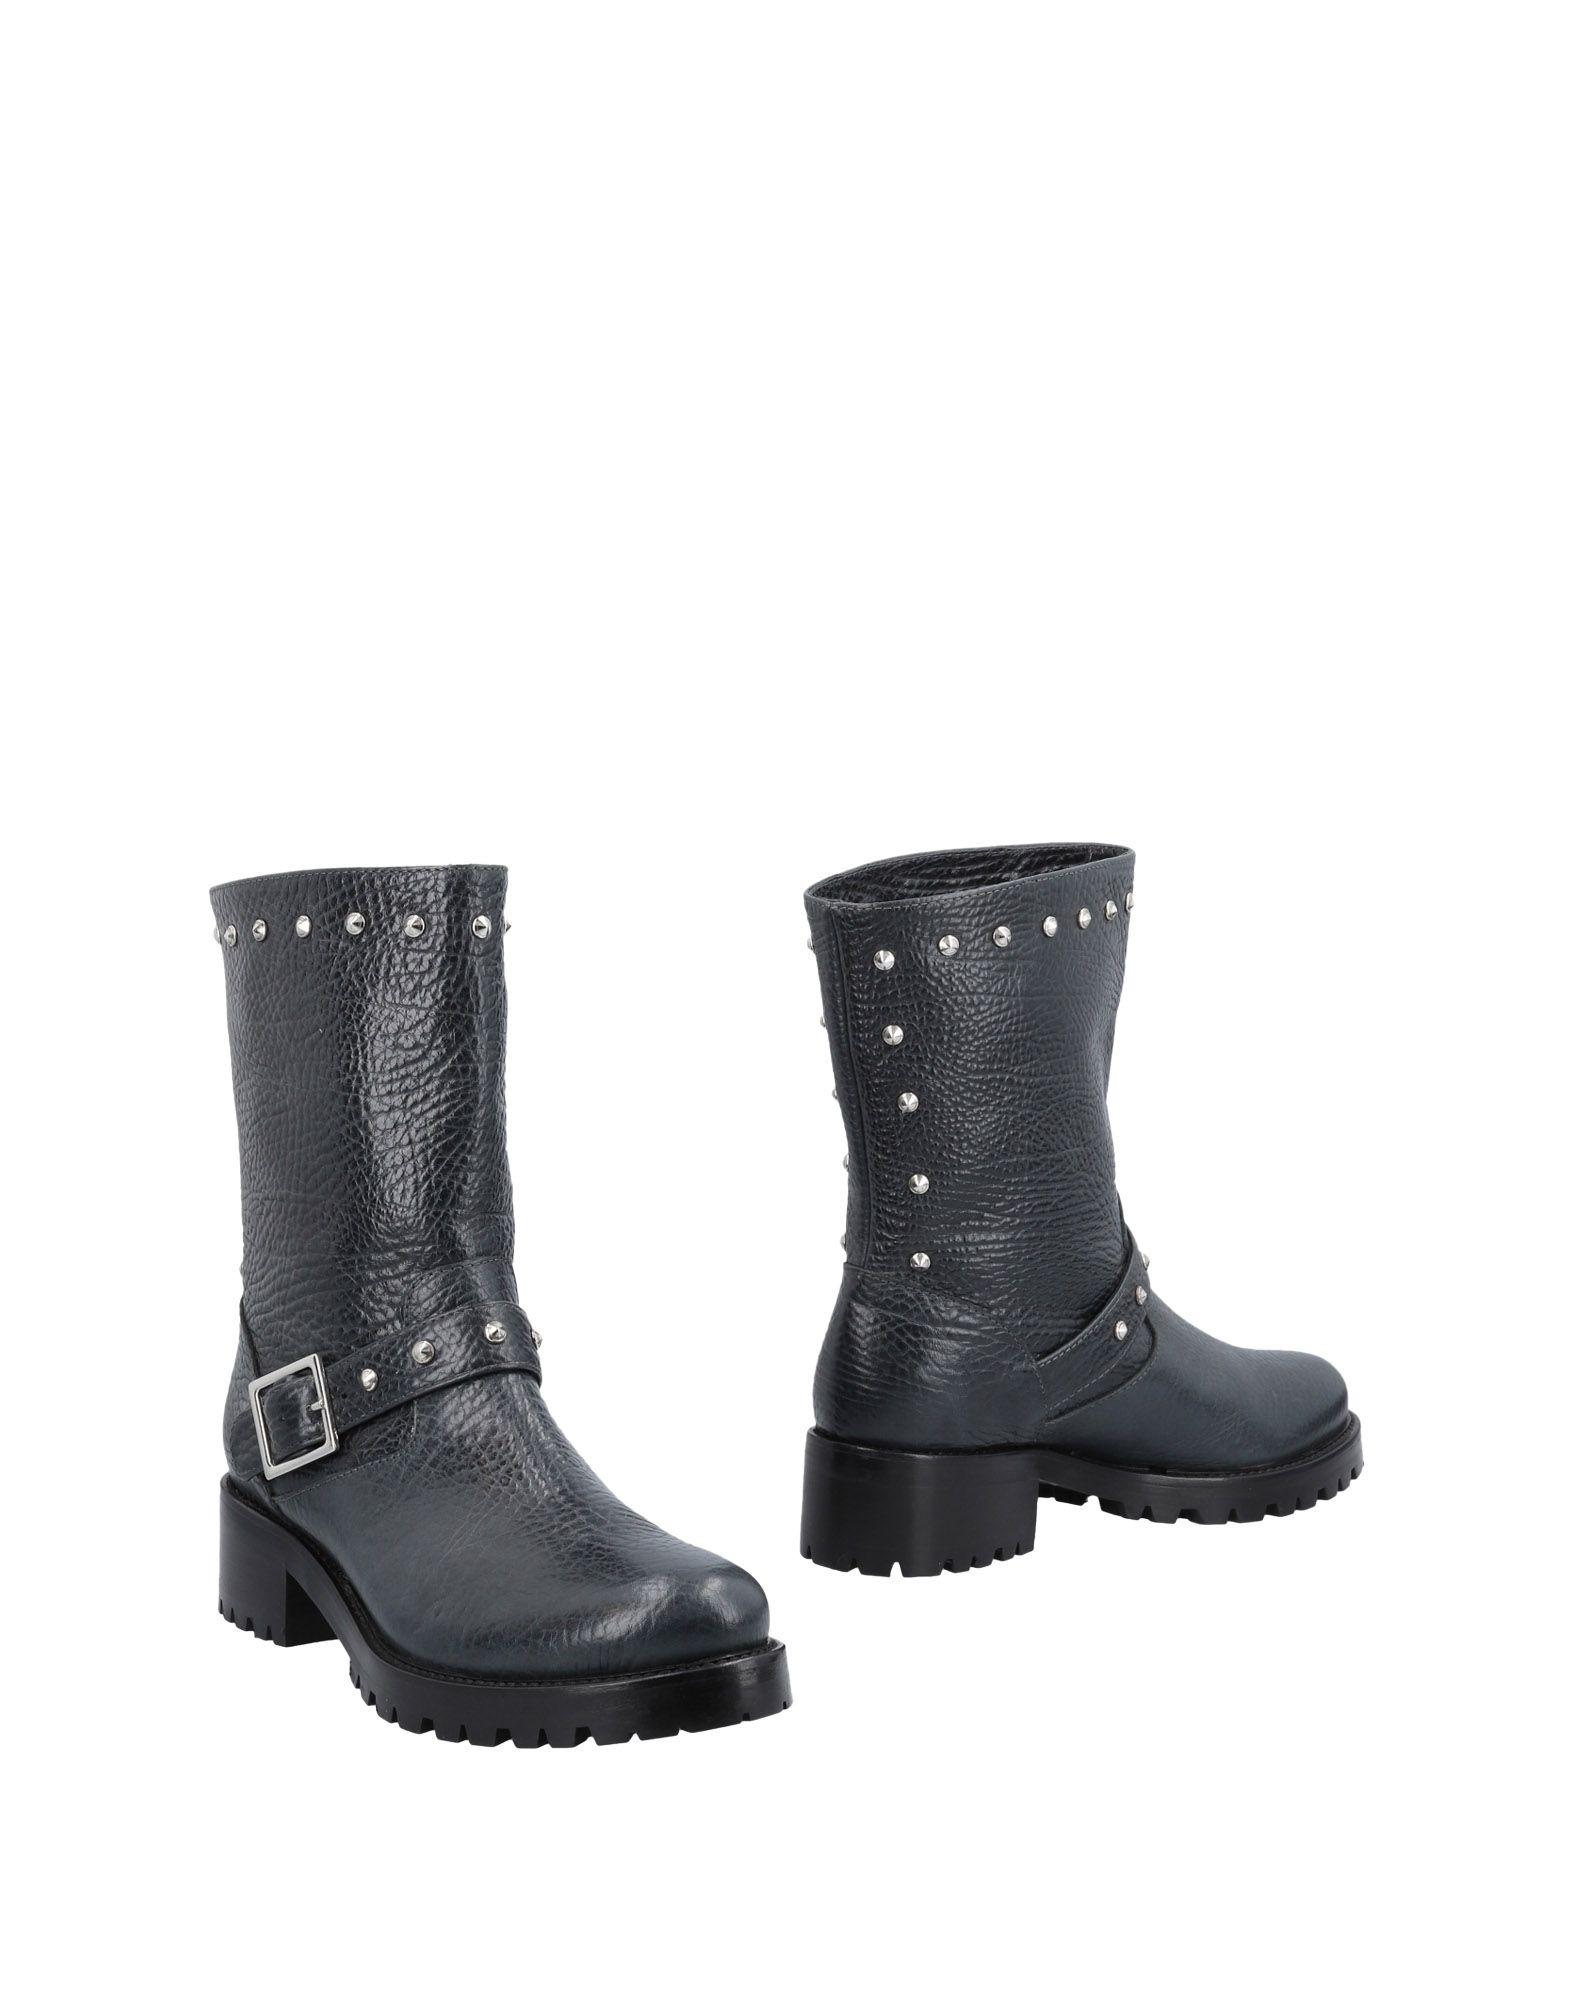 Moda - Stivaletti Cavallini Donna - Moda 11483721RF 6a8b48